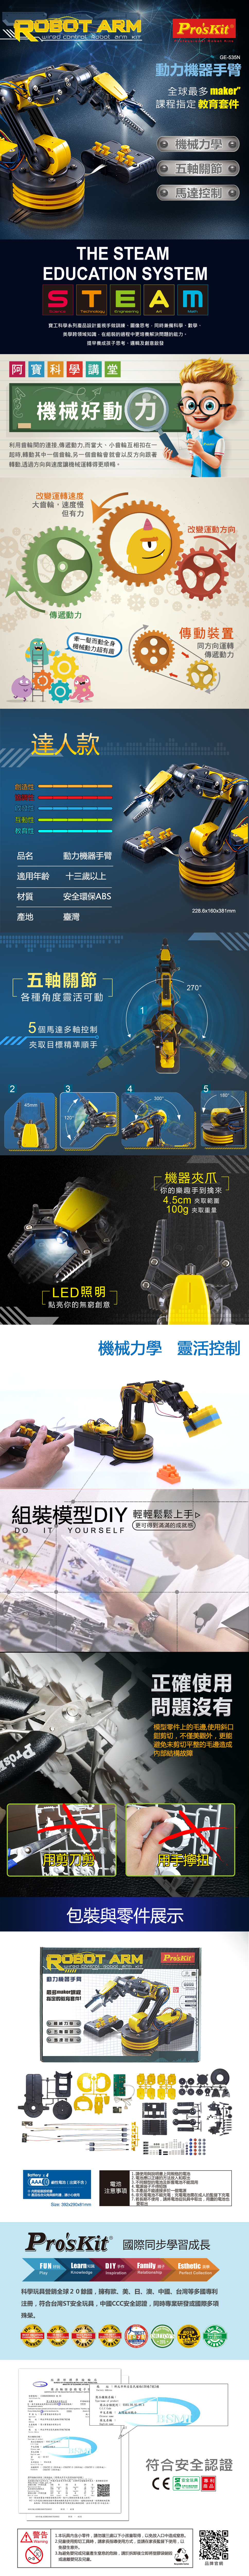 WIRED CONTROL ROBOTARM 動力機器手臂,機械力學,五軸關節各種角度靈活可動,馬達控制,適用年齡13歲以上, 適用年齡13歲以上,安全環保ABS,台灣製造,機器夾爪4.5cm夾取範圍,100g夾取重量,LED照明設備.